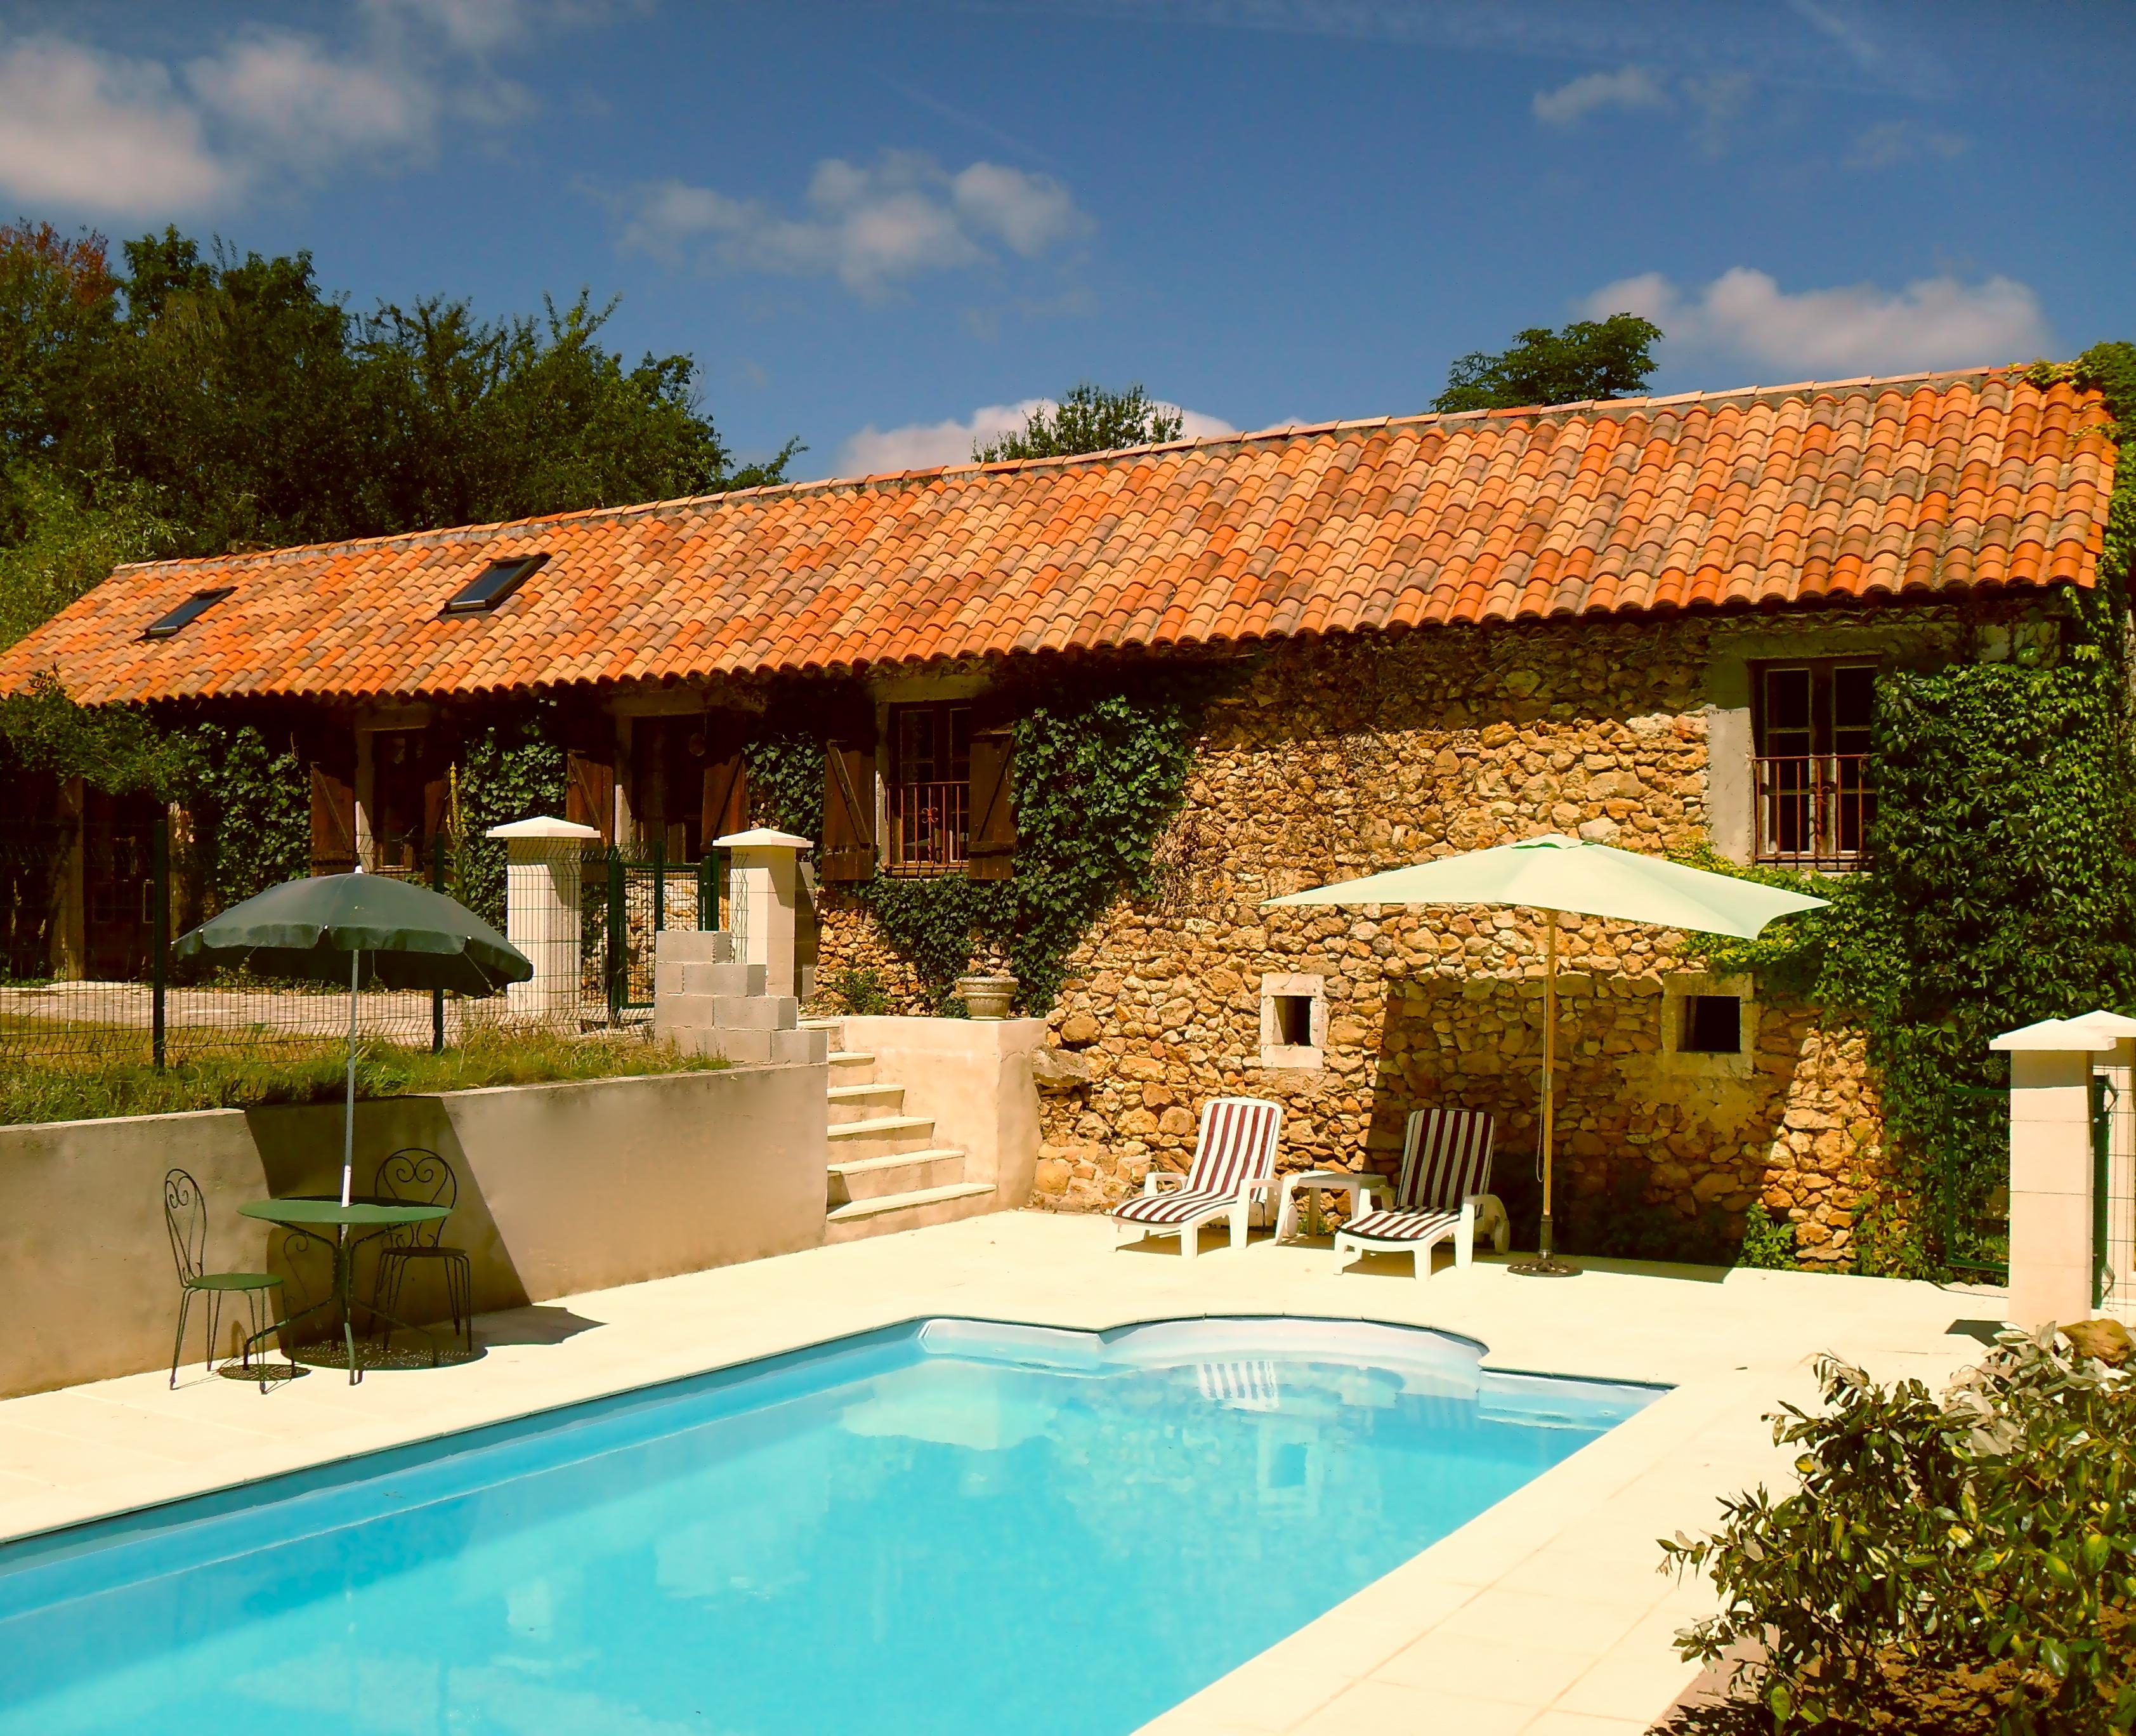 La Bergerie - Swimming pool